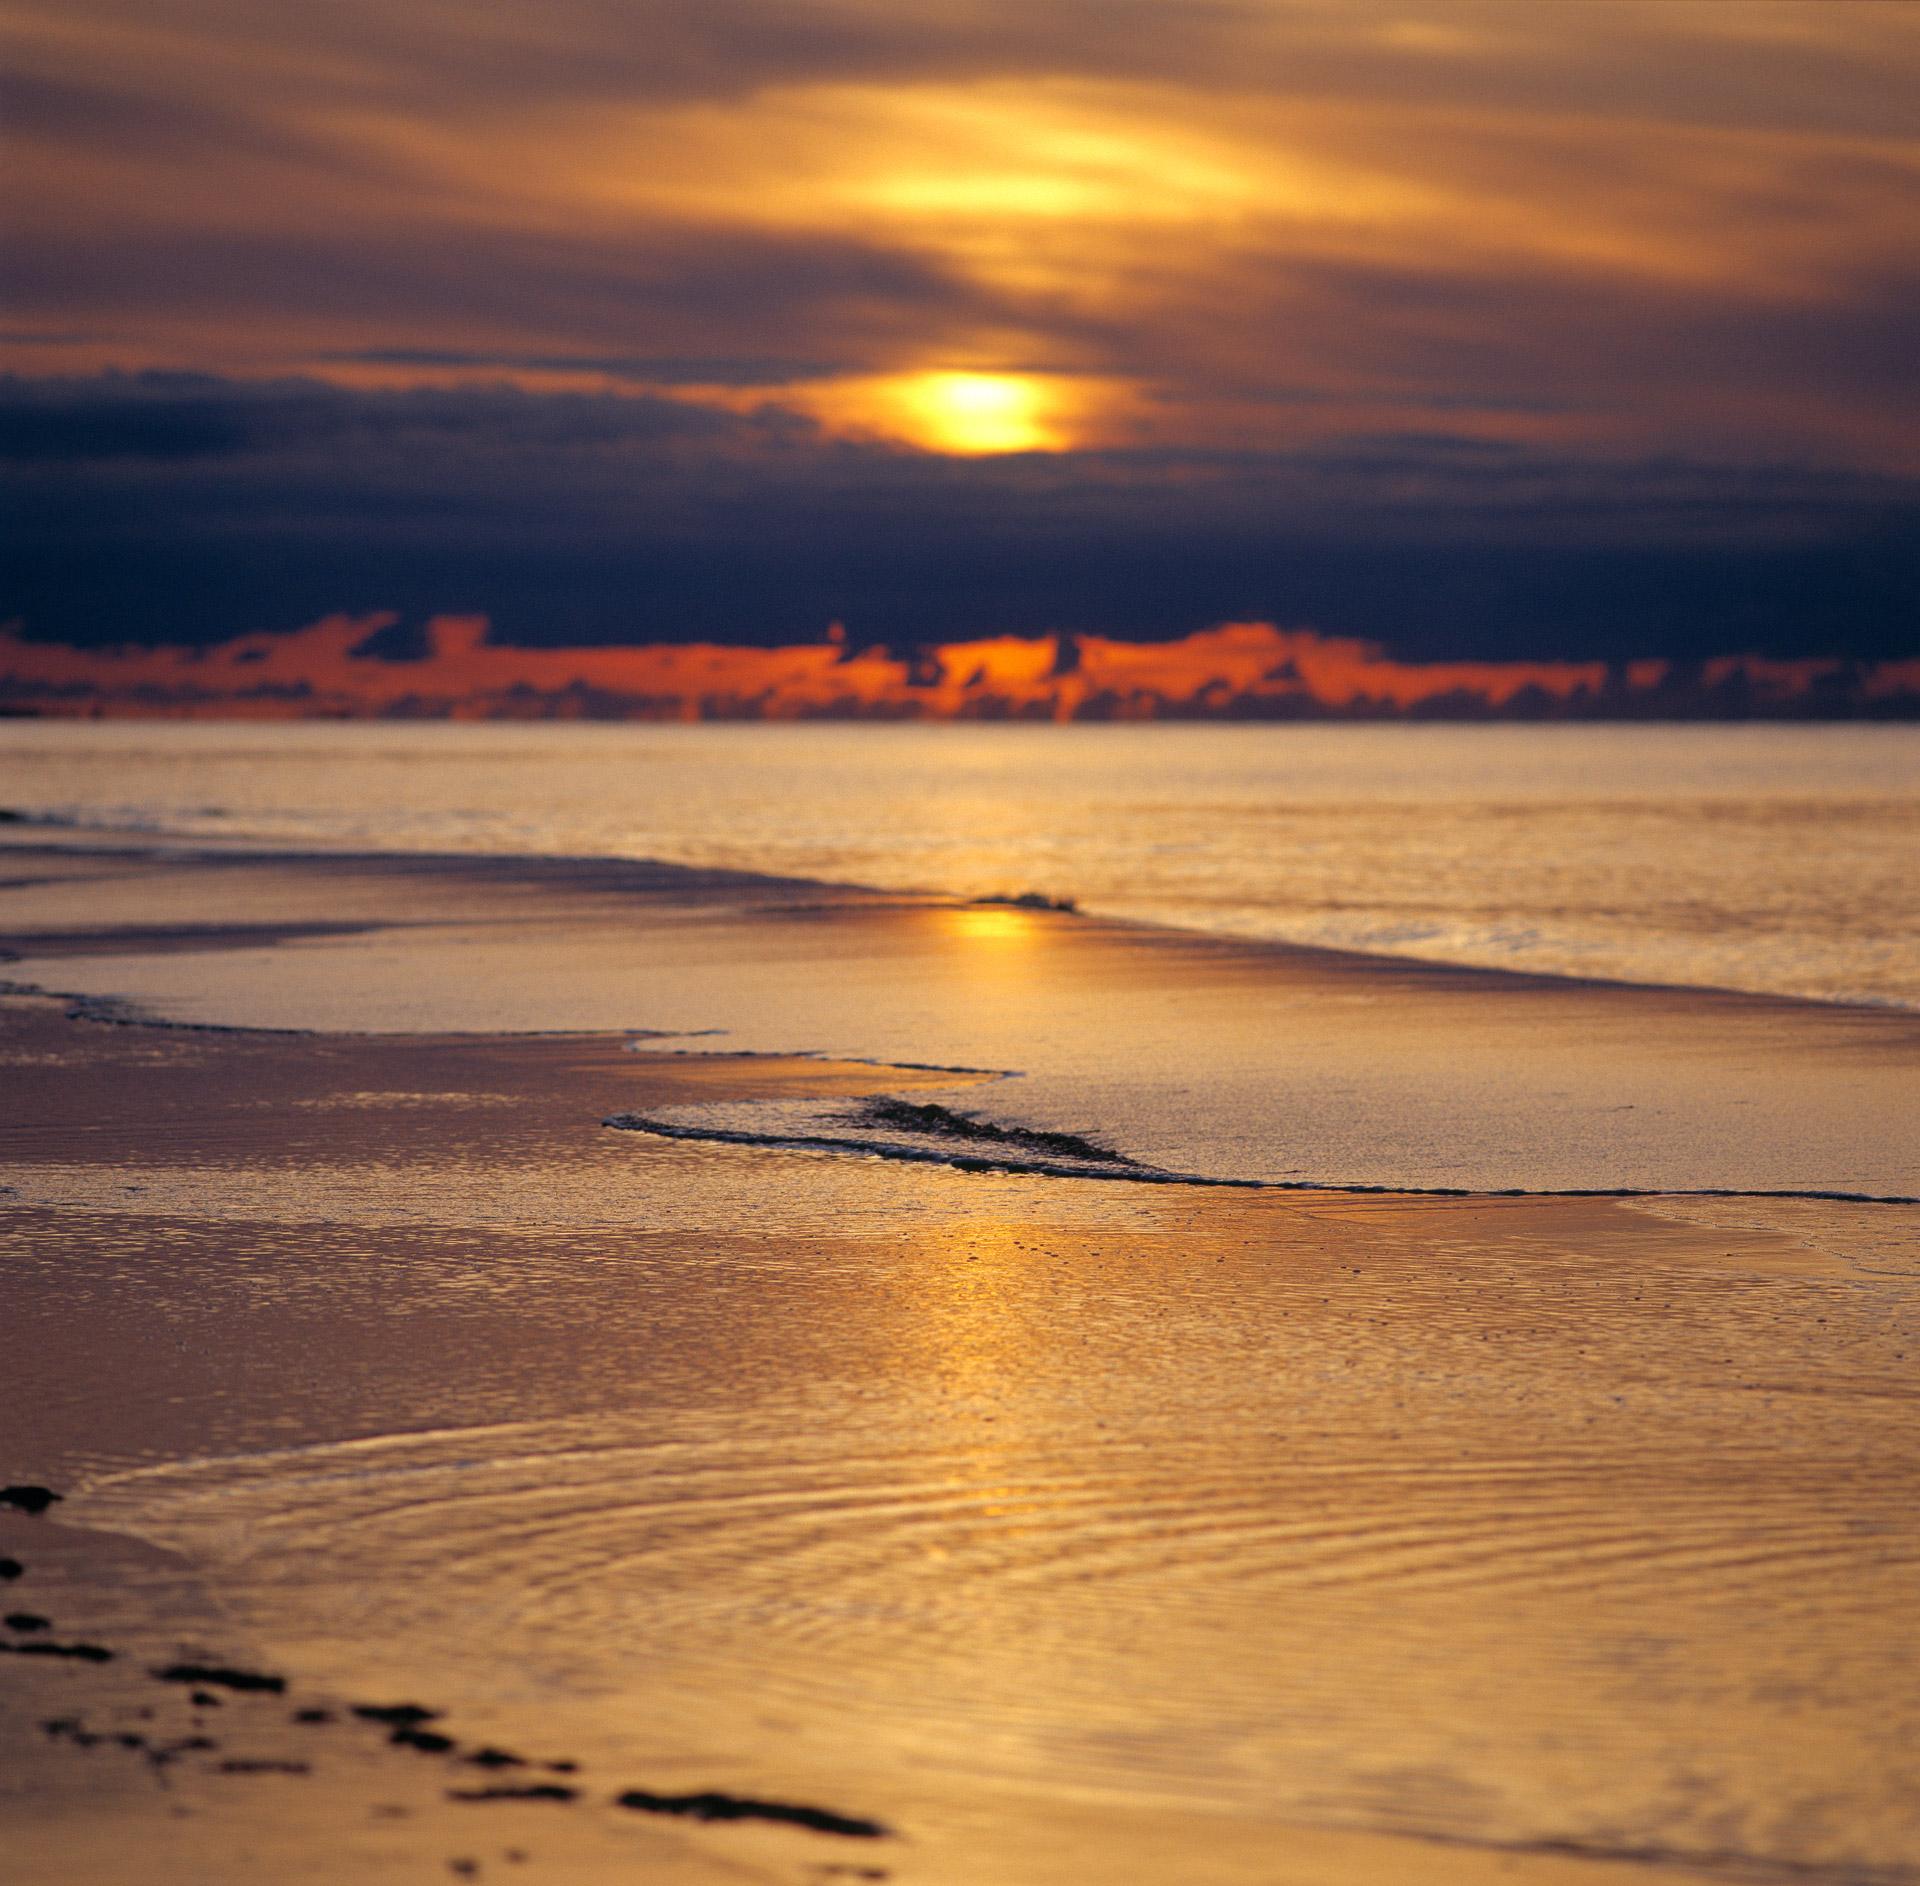 Sunset over the North Sea in Kandestederne in Denmark